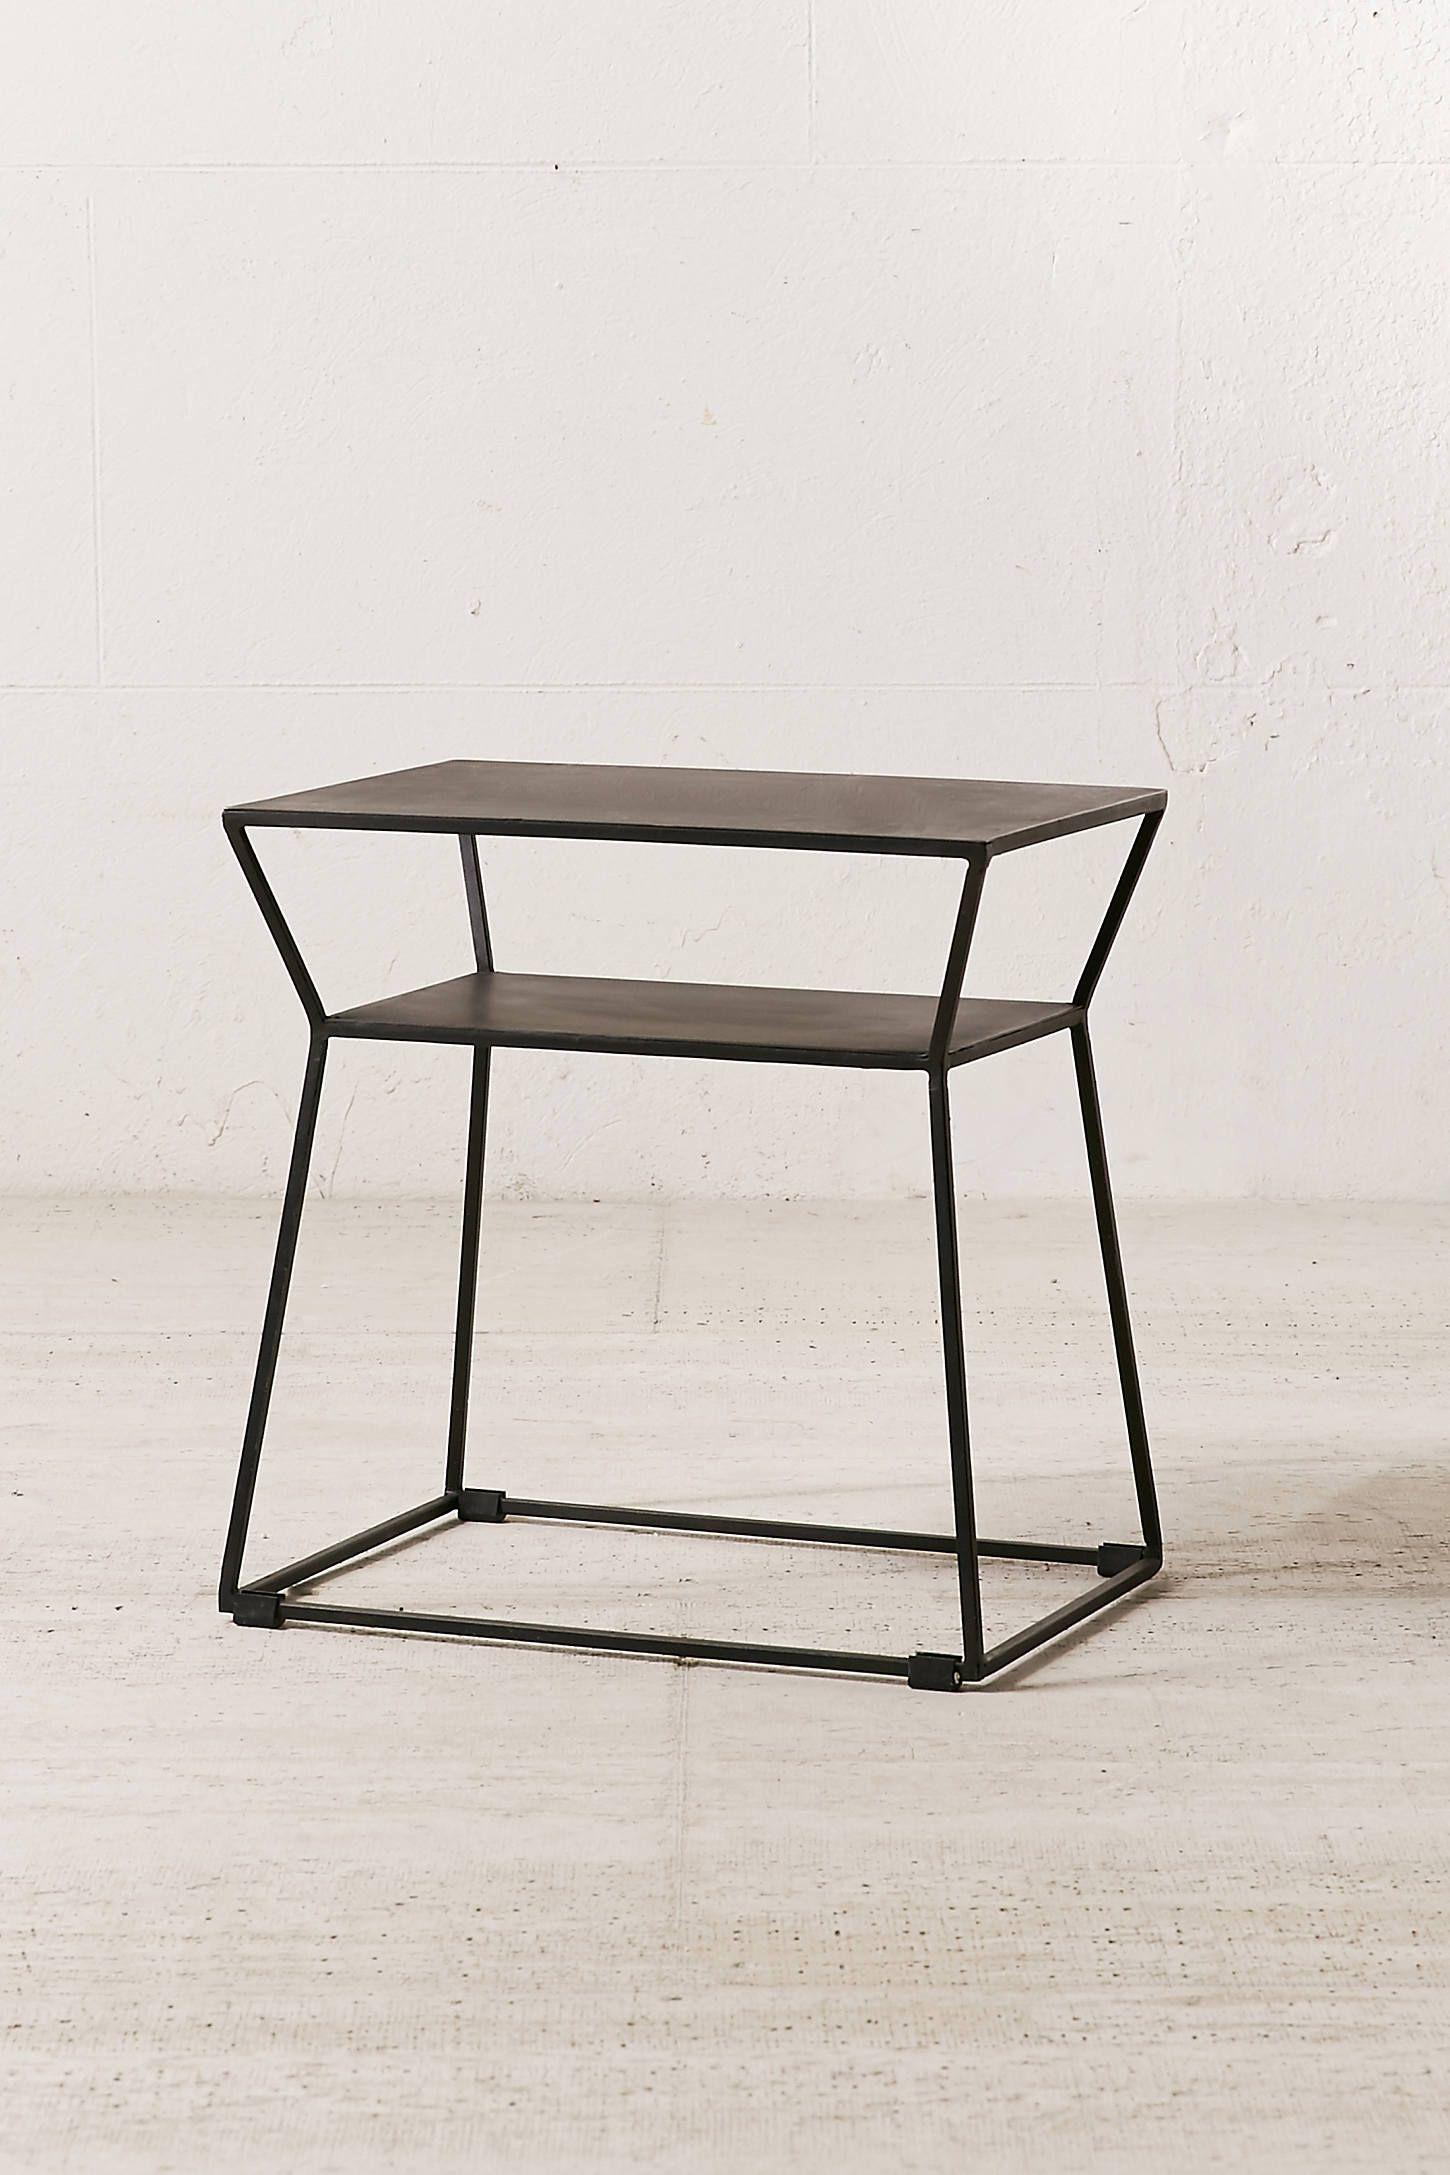 Osaka metal side table in apt pinterest metal side table